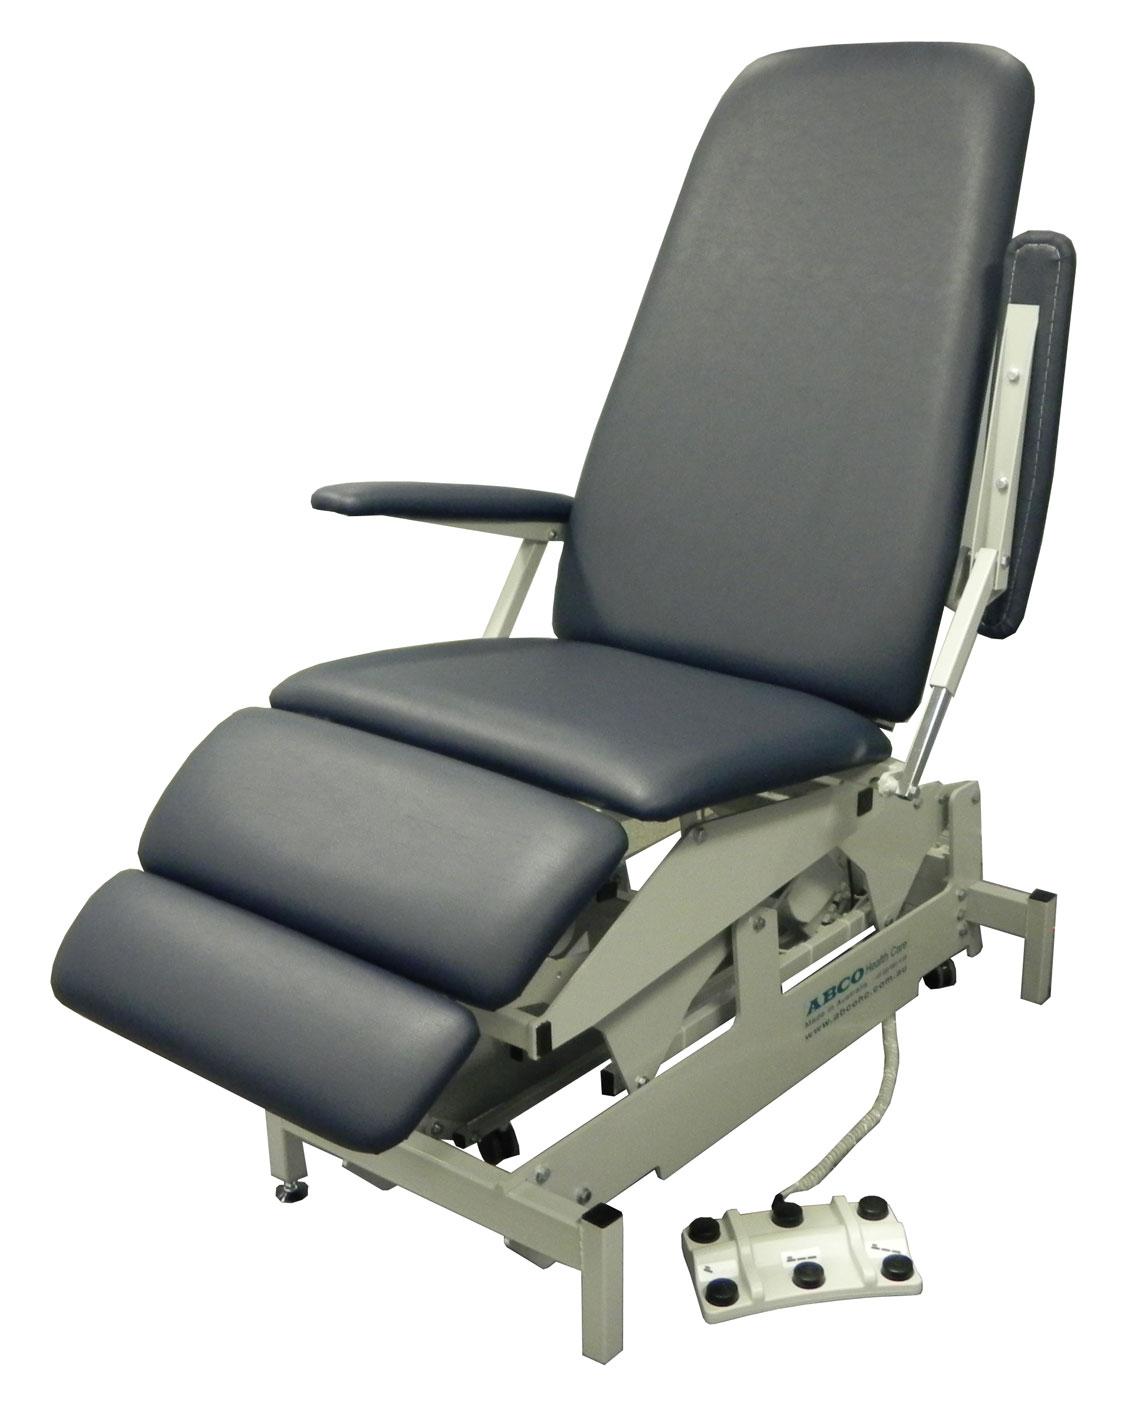 Abco Health Care D100 Treatment Chair